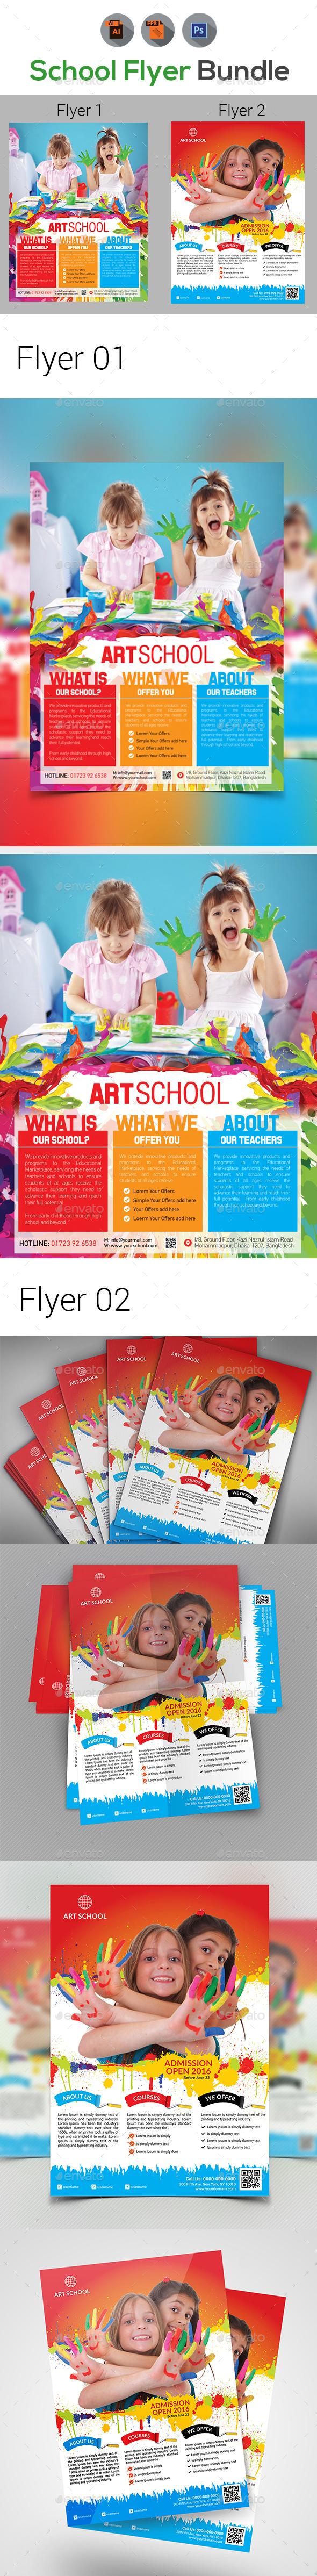 Kids Arts School Flyers Template - Flyers Print Templates